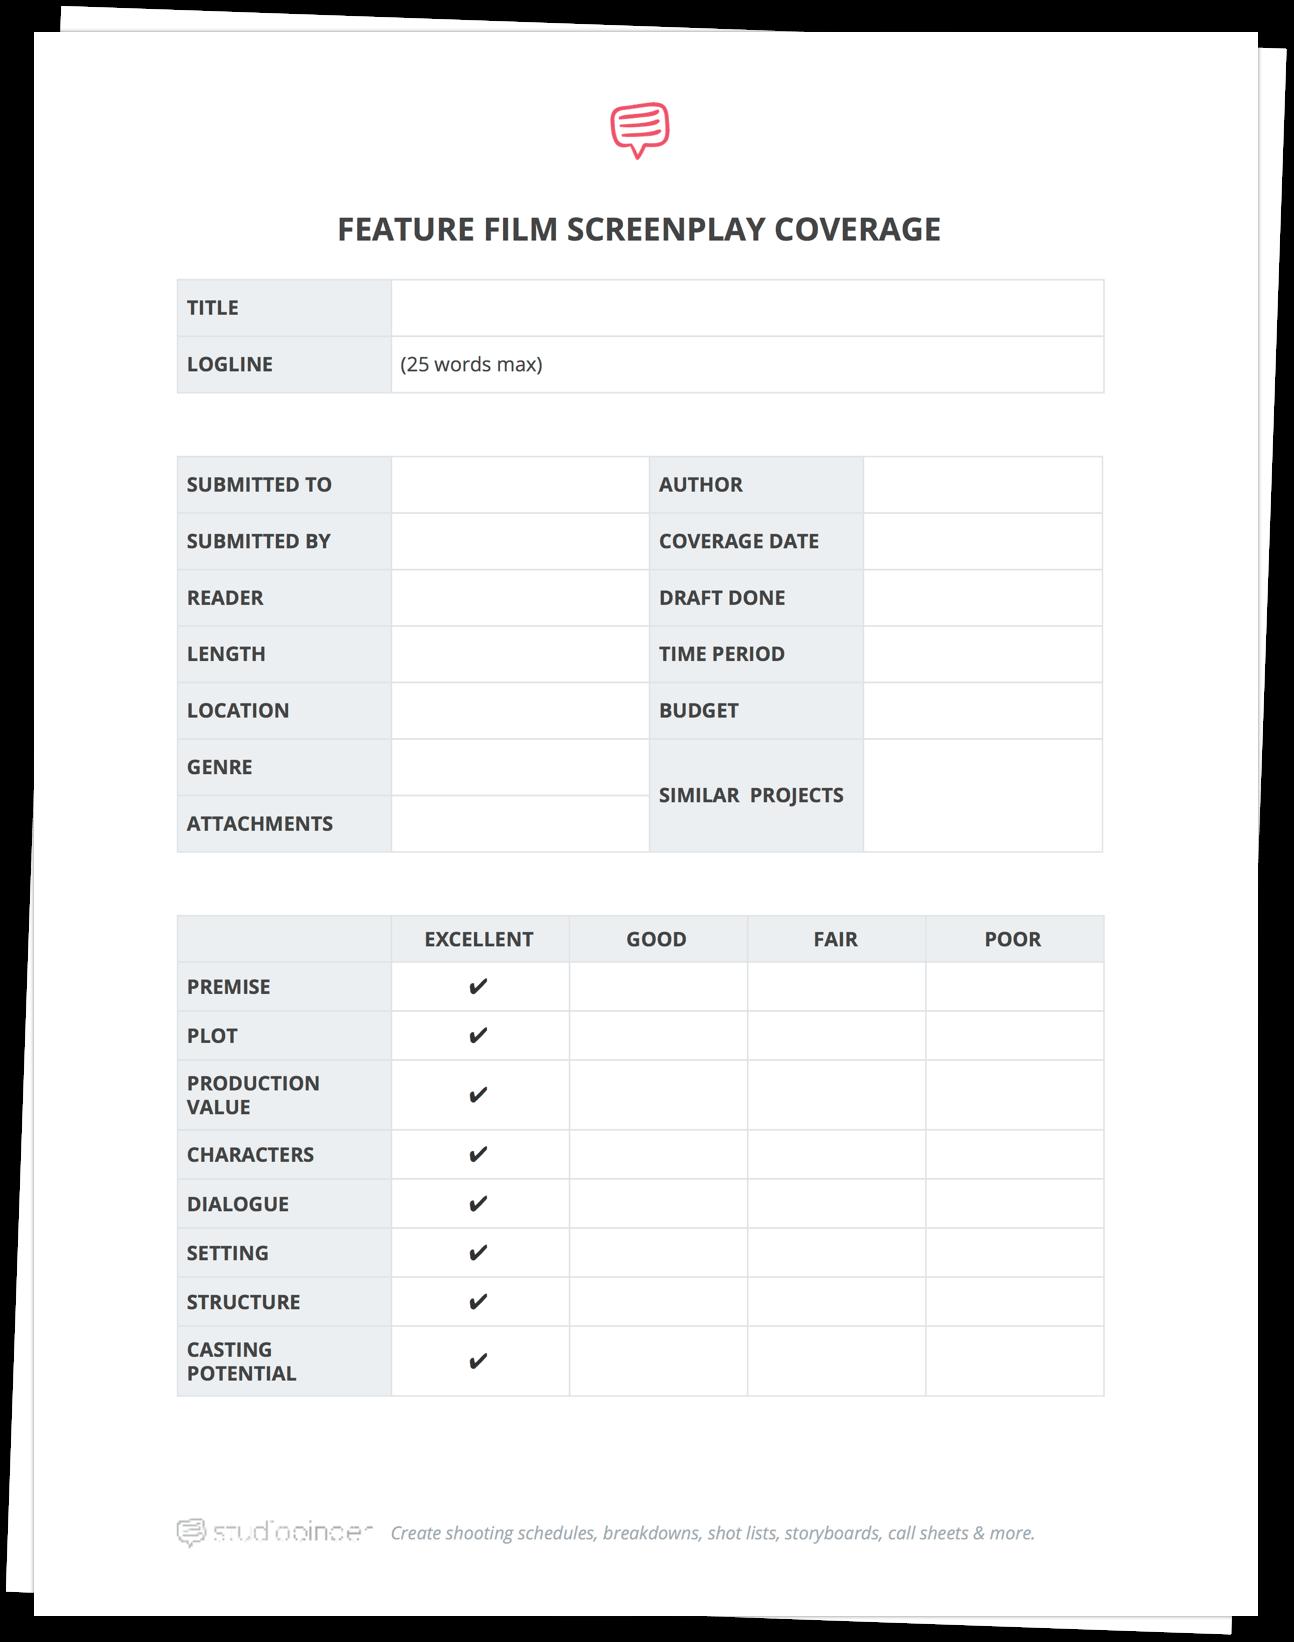 movie scripts pdf free download